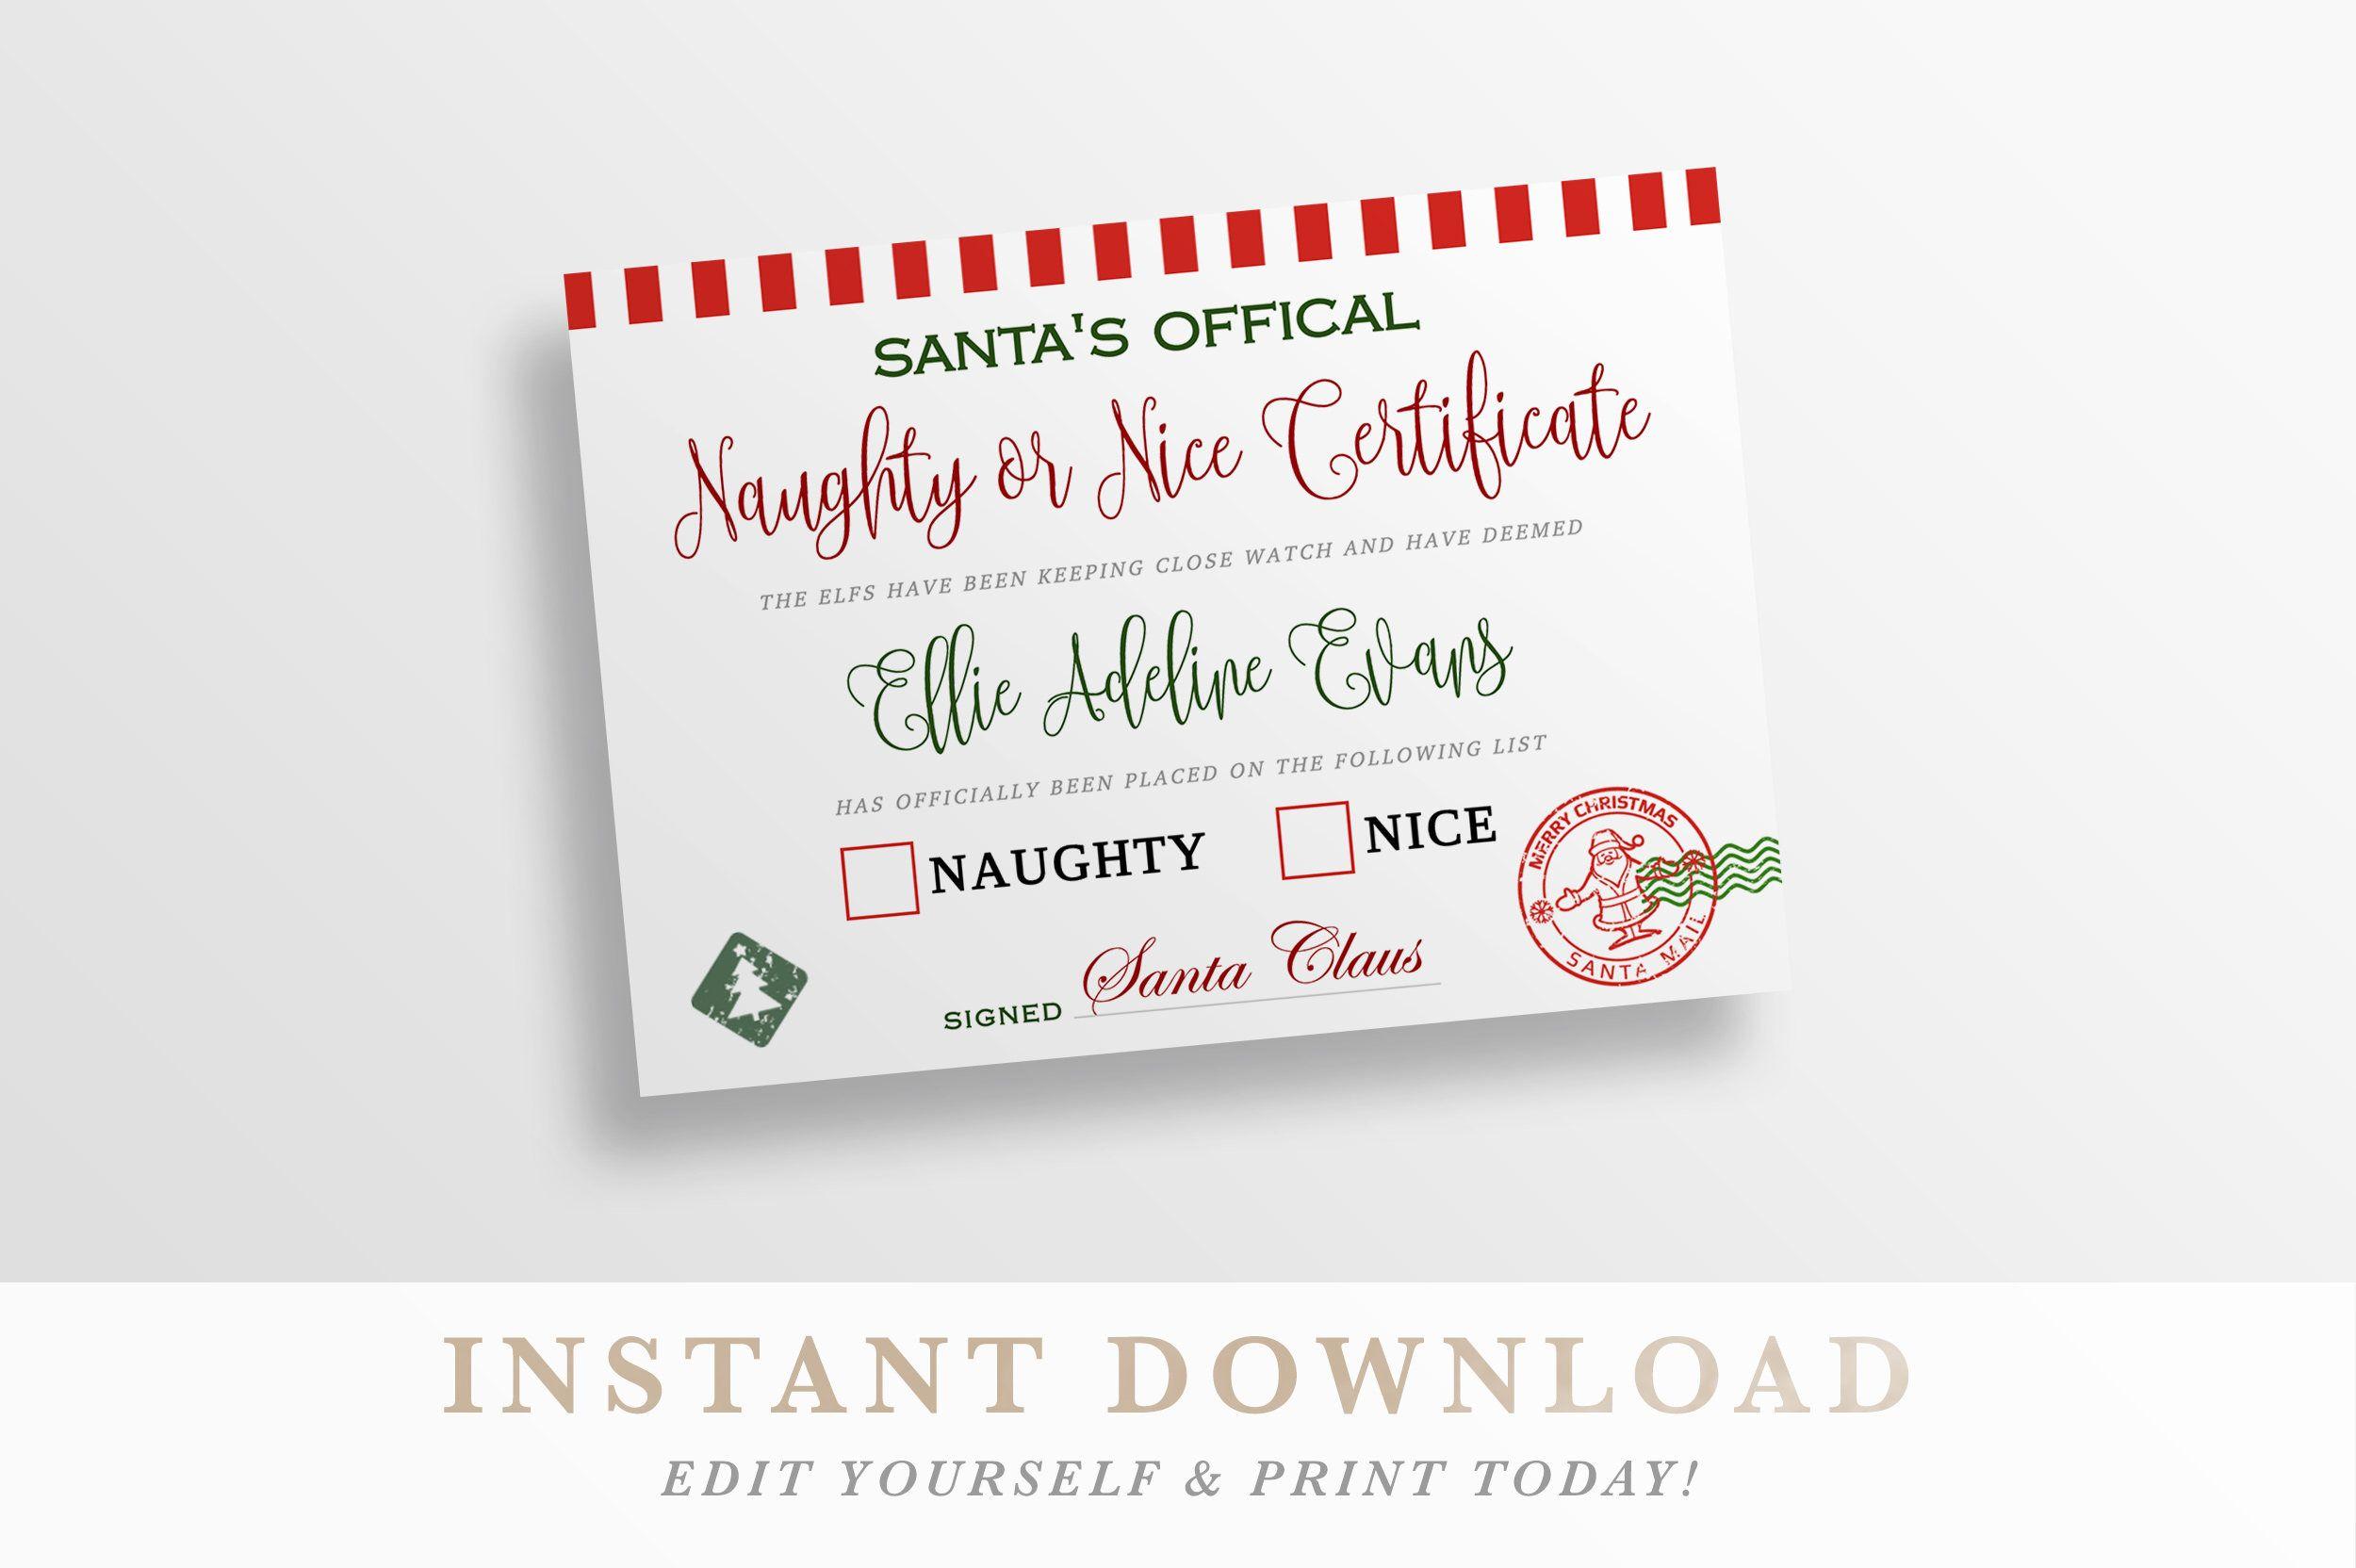 naughty or nice christmas party invitations - econhomes.com